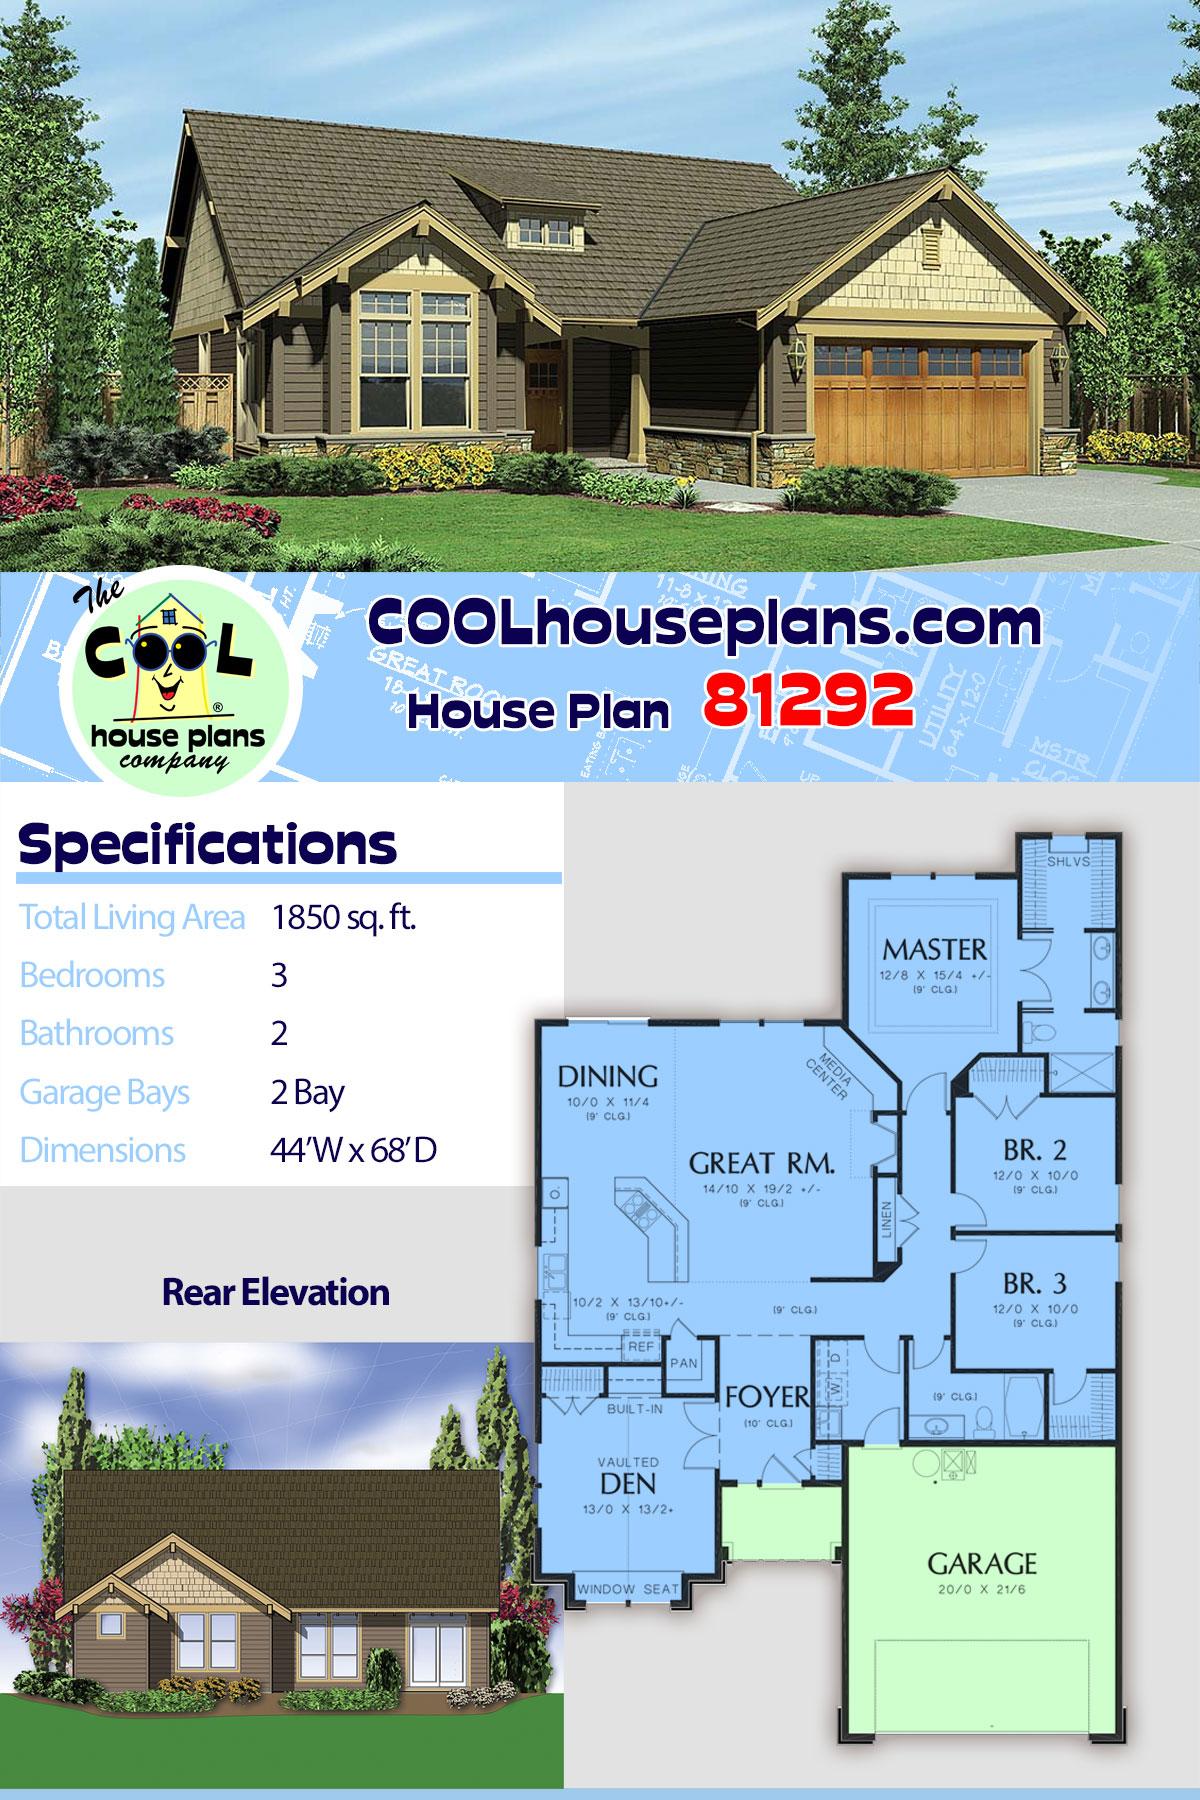 Bungalow, Craftsman, Narrow Lot House Plan 81292 with 3 Beds, 2 Baths, 2 Car Garage